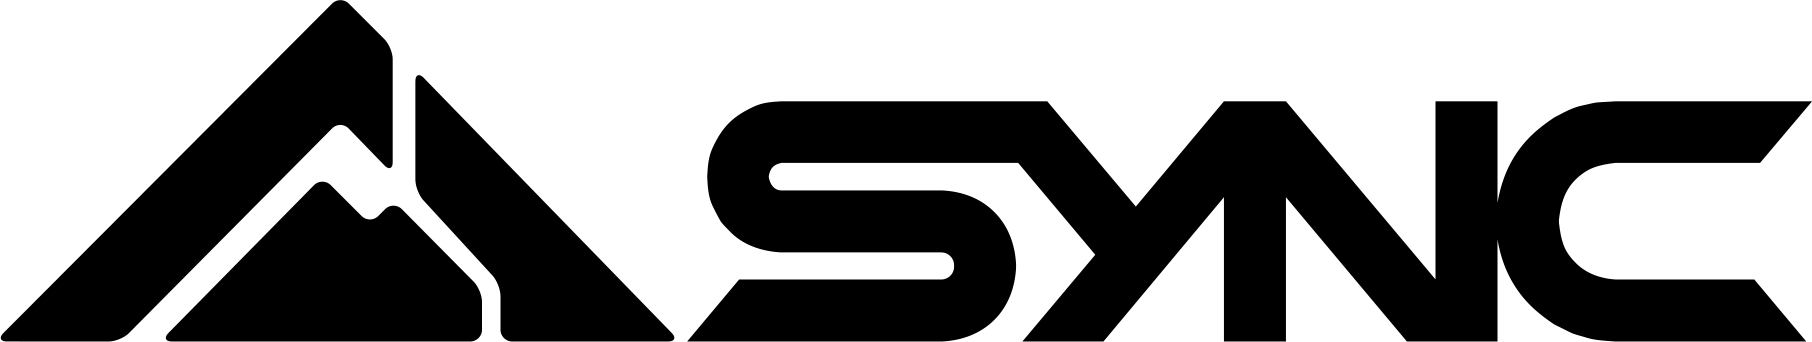 sync-logo-horizontal